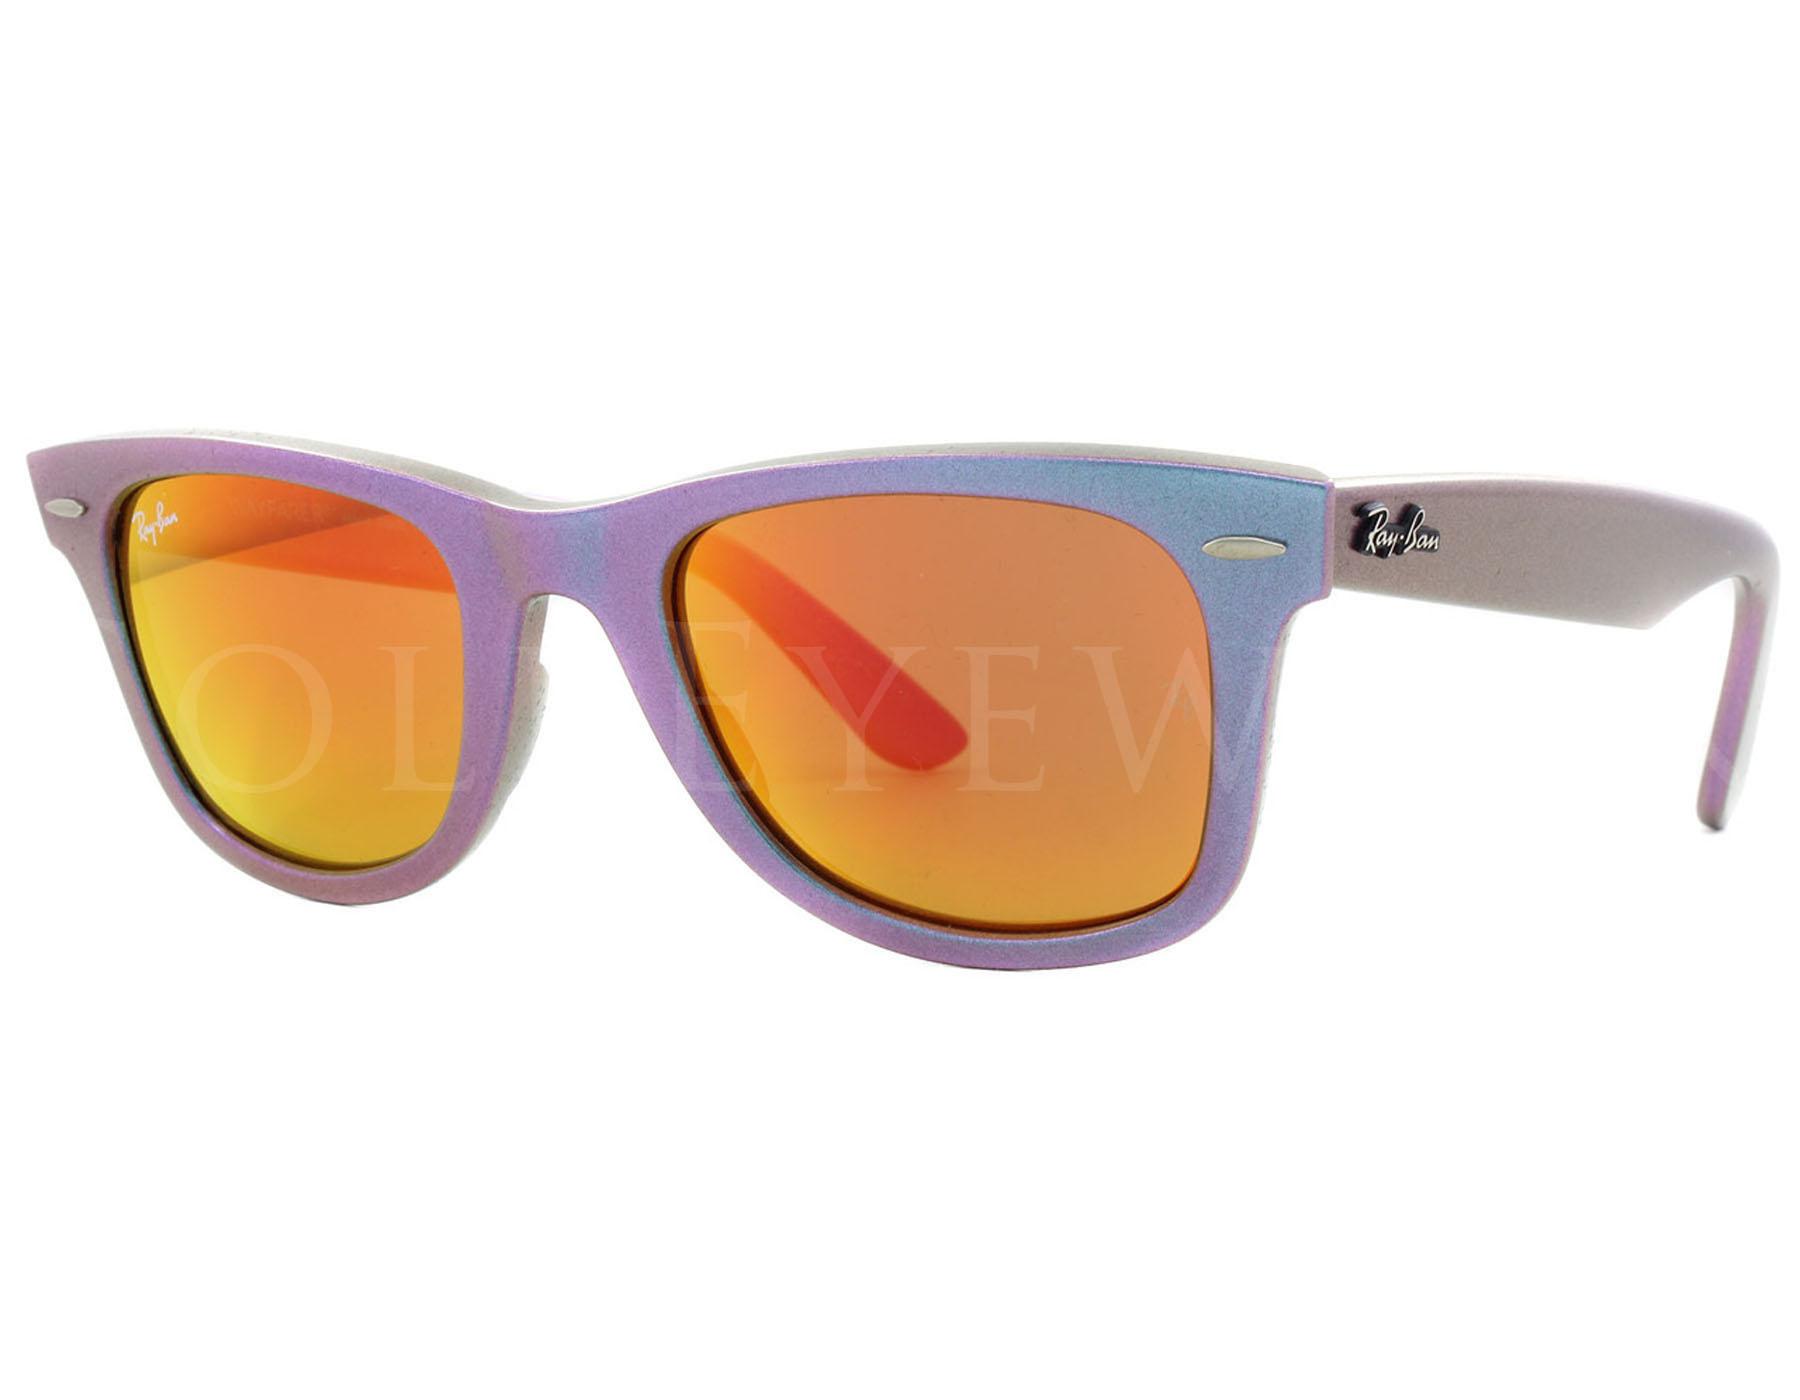 7ef0e1b5734d Details about NEW Ray Ban 2140 6111 69 50mm Original Wayfarer Pearl Grn  Pple Petrol Sunglasses